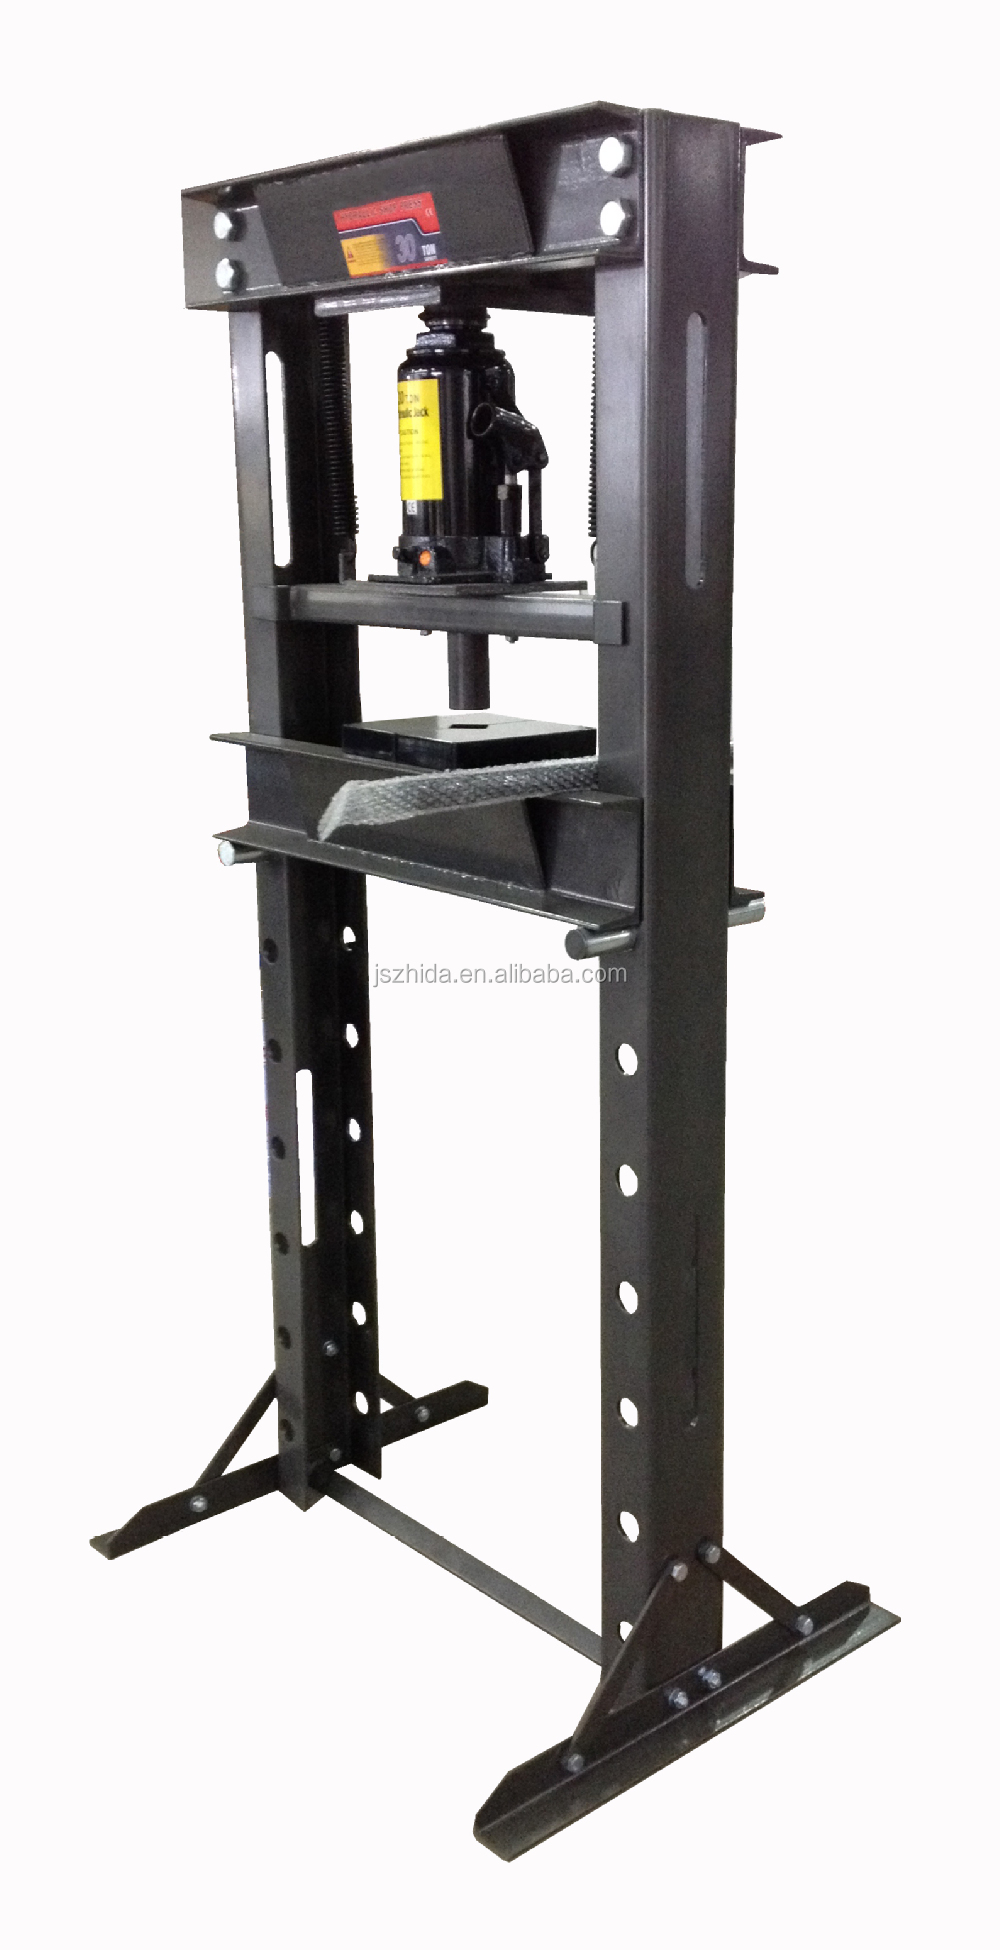 New Hydraulic Press For Bushings